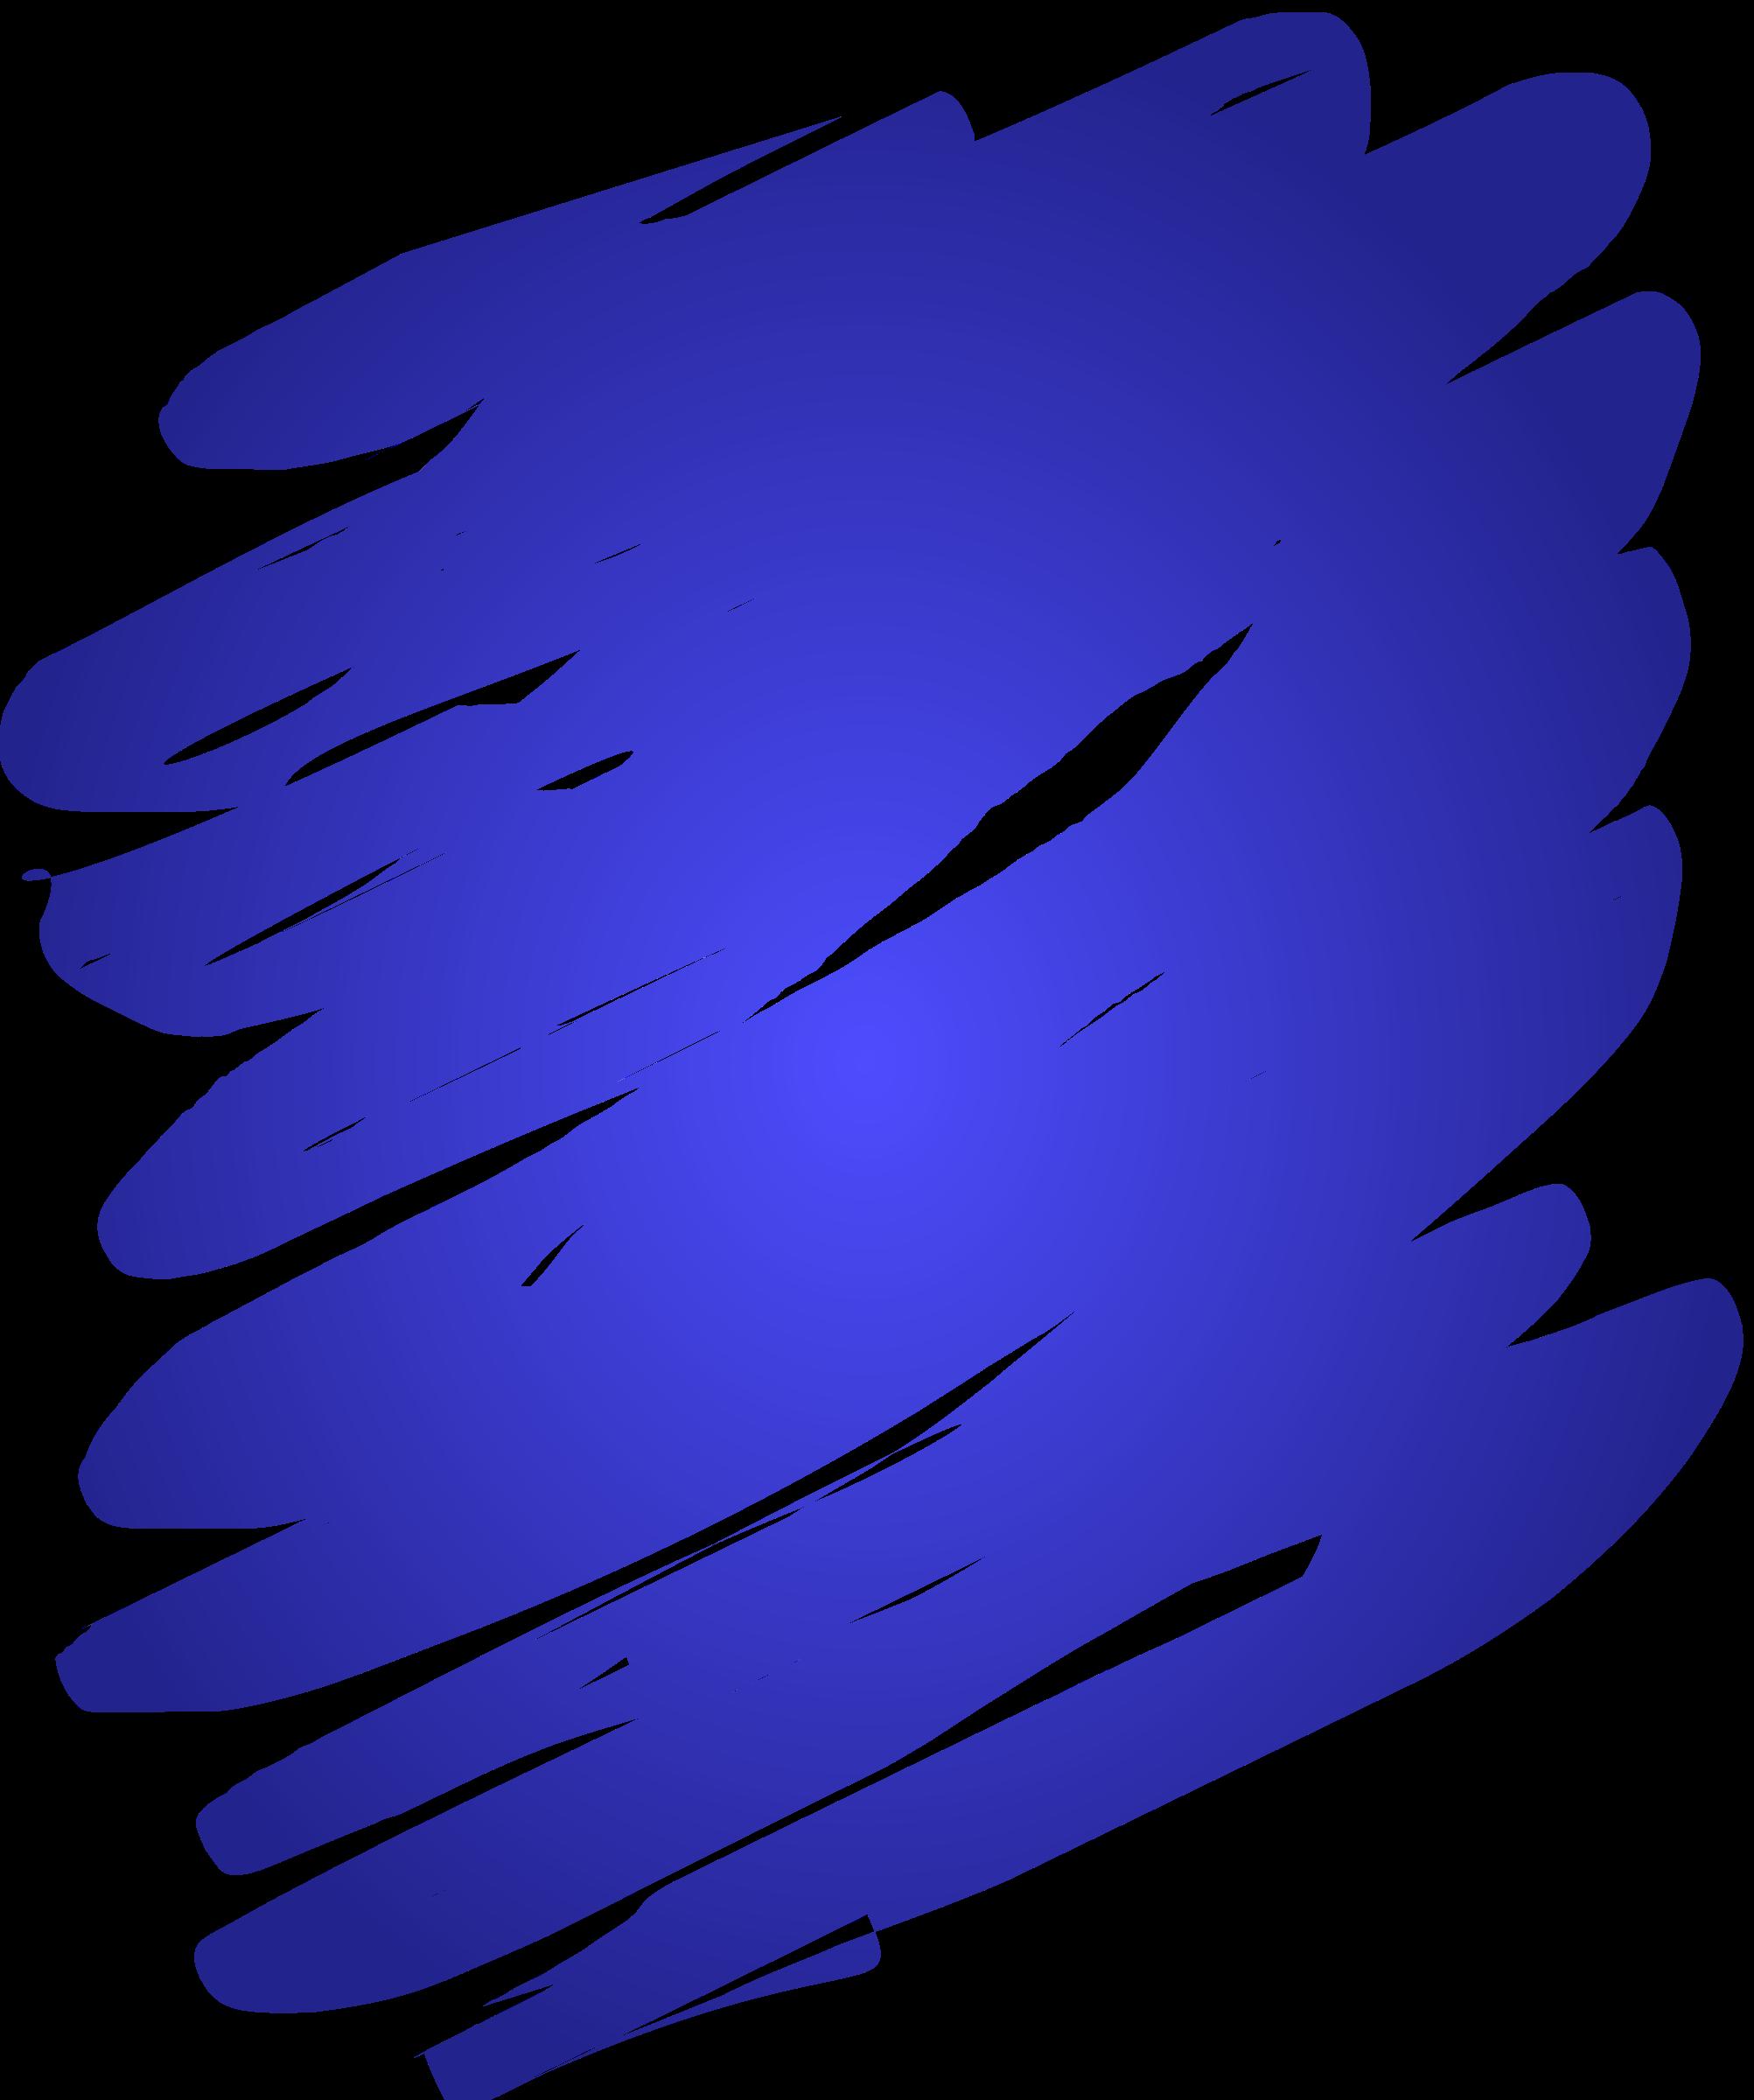 Blue clipart scribble. Blend big image png